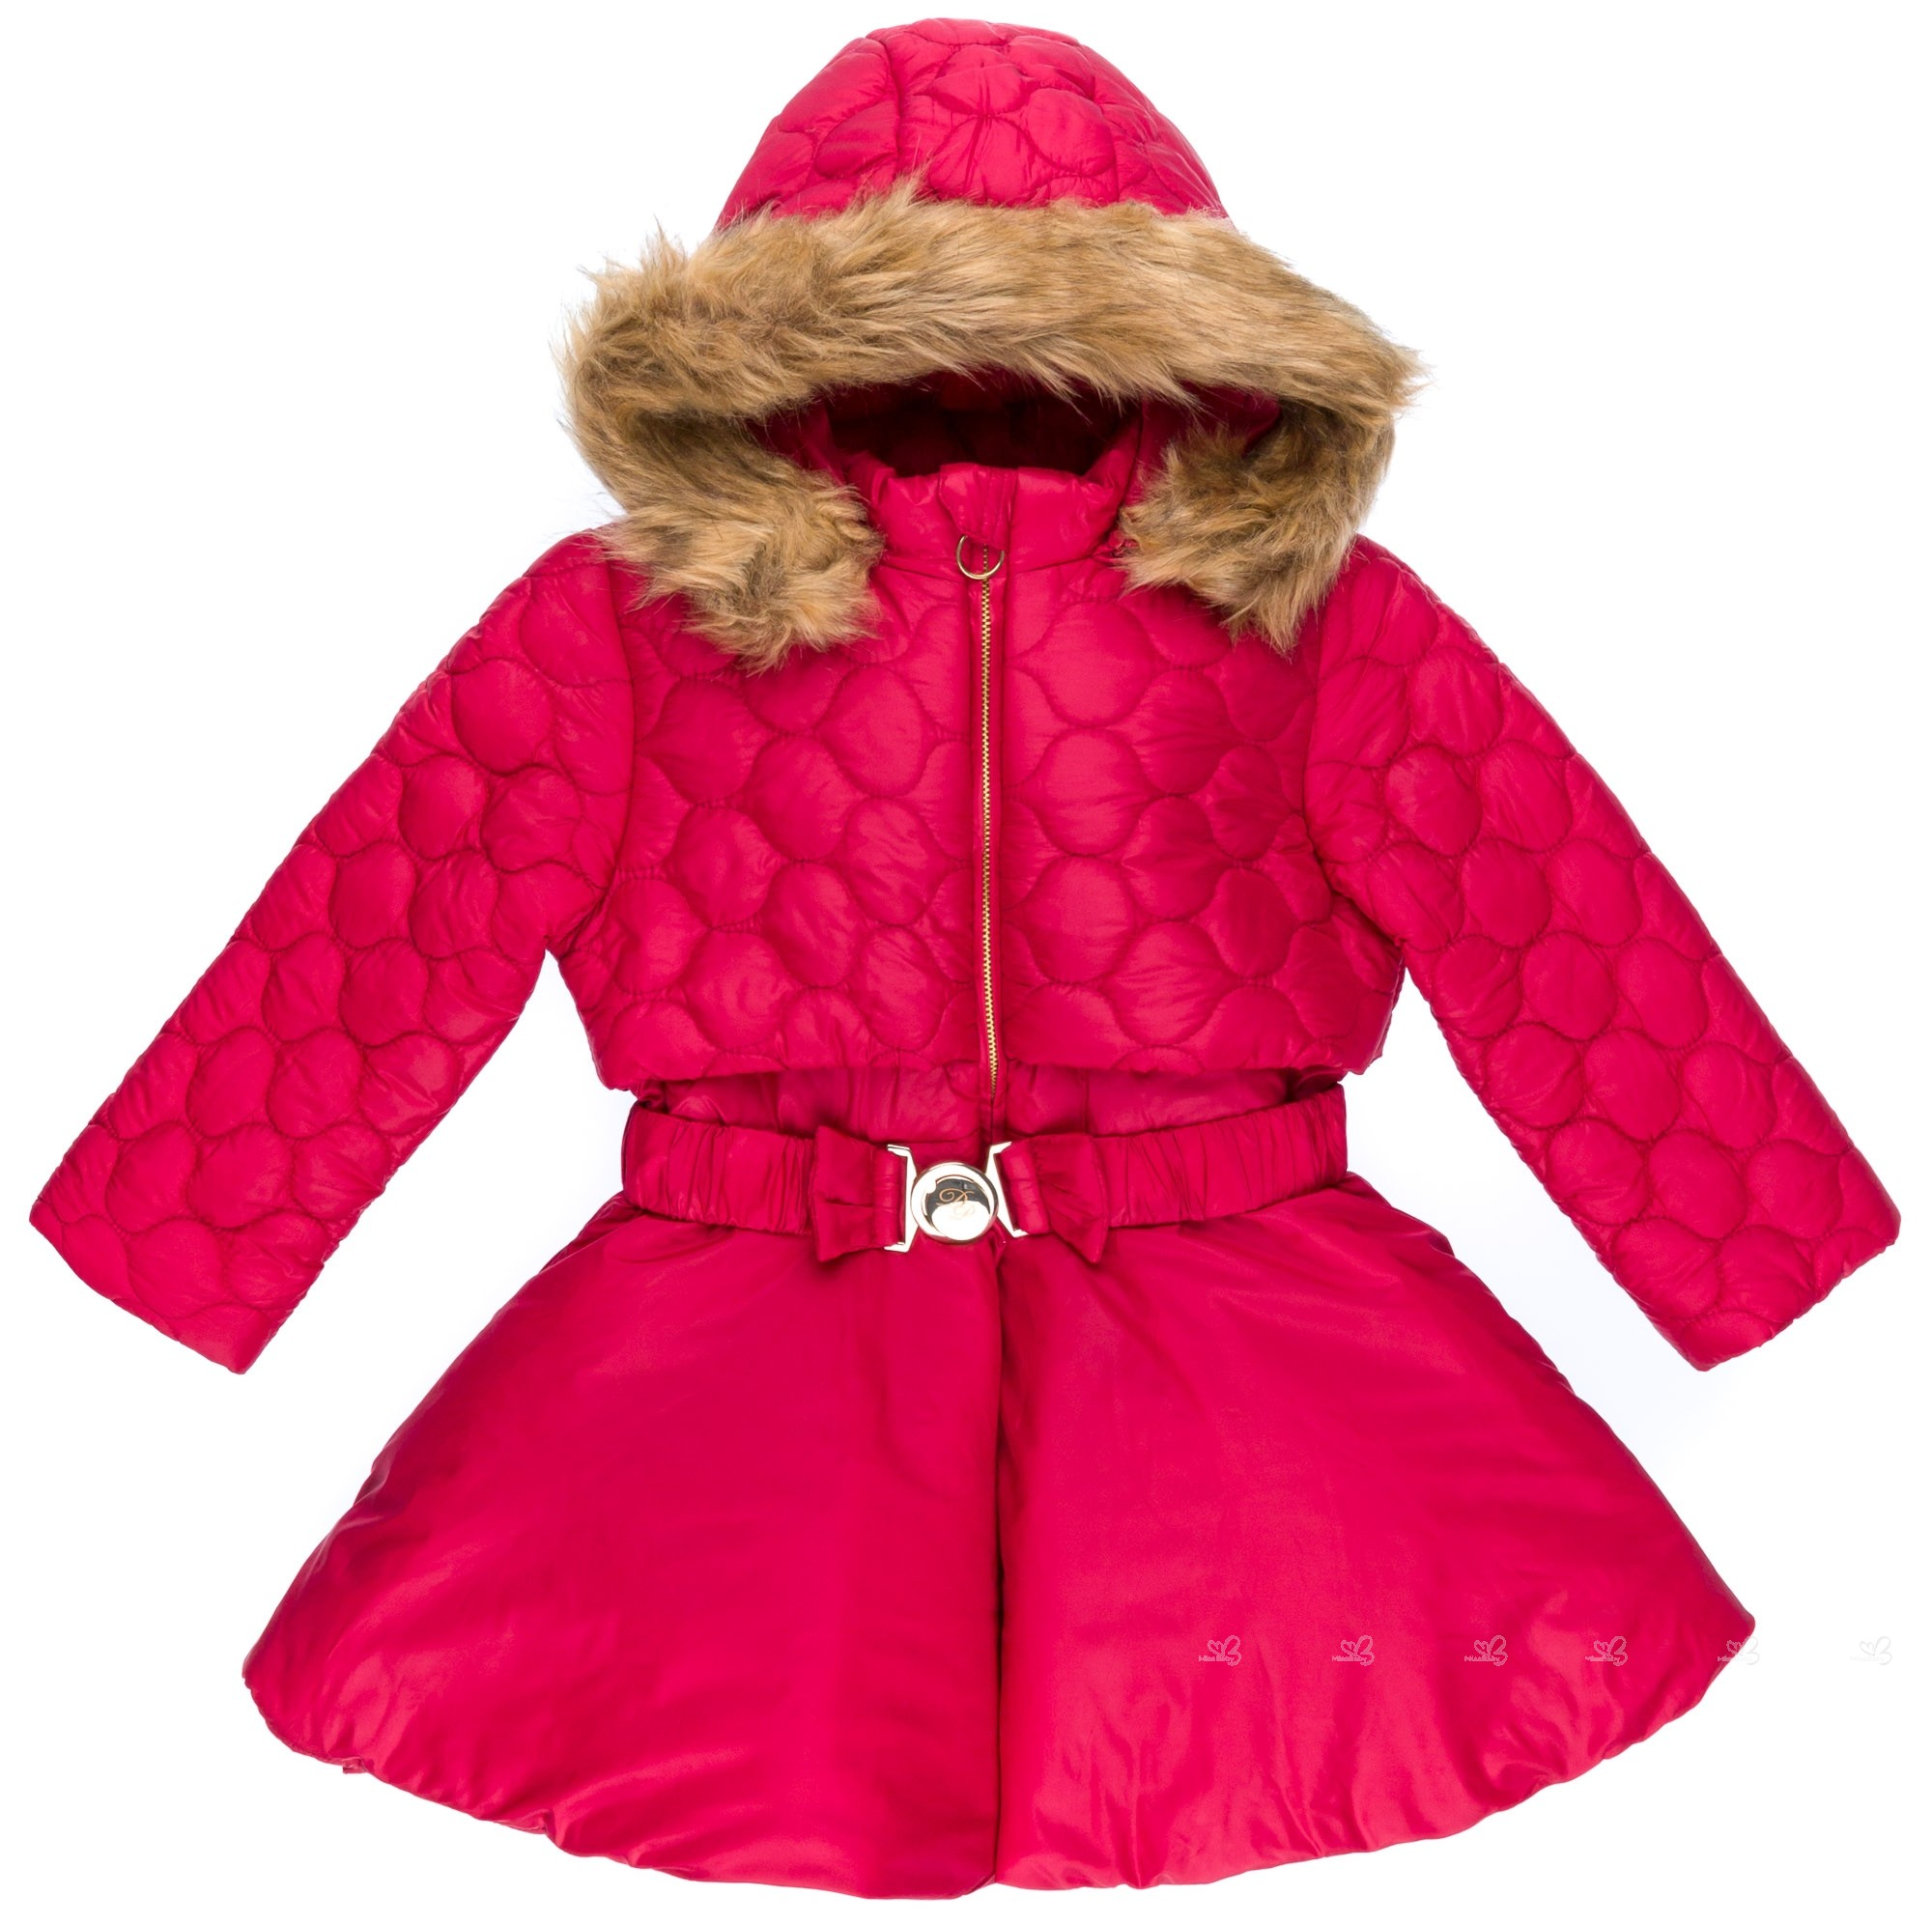 Dolce Petit Abrigo Niña Efecto 2 Pieza Rojo   Capucha Desmontable Pelo  Sintético ... cb141ed7248